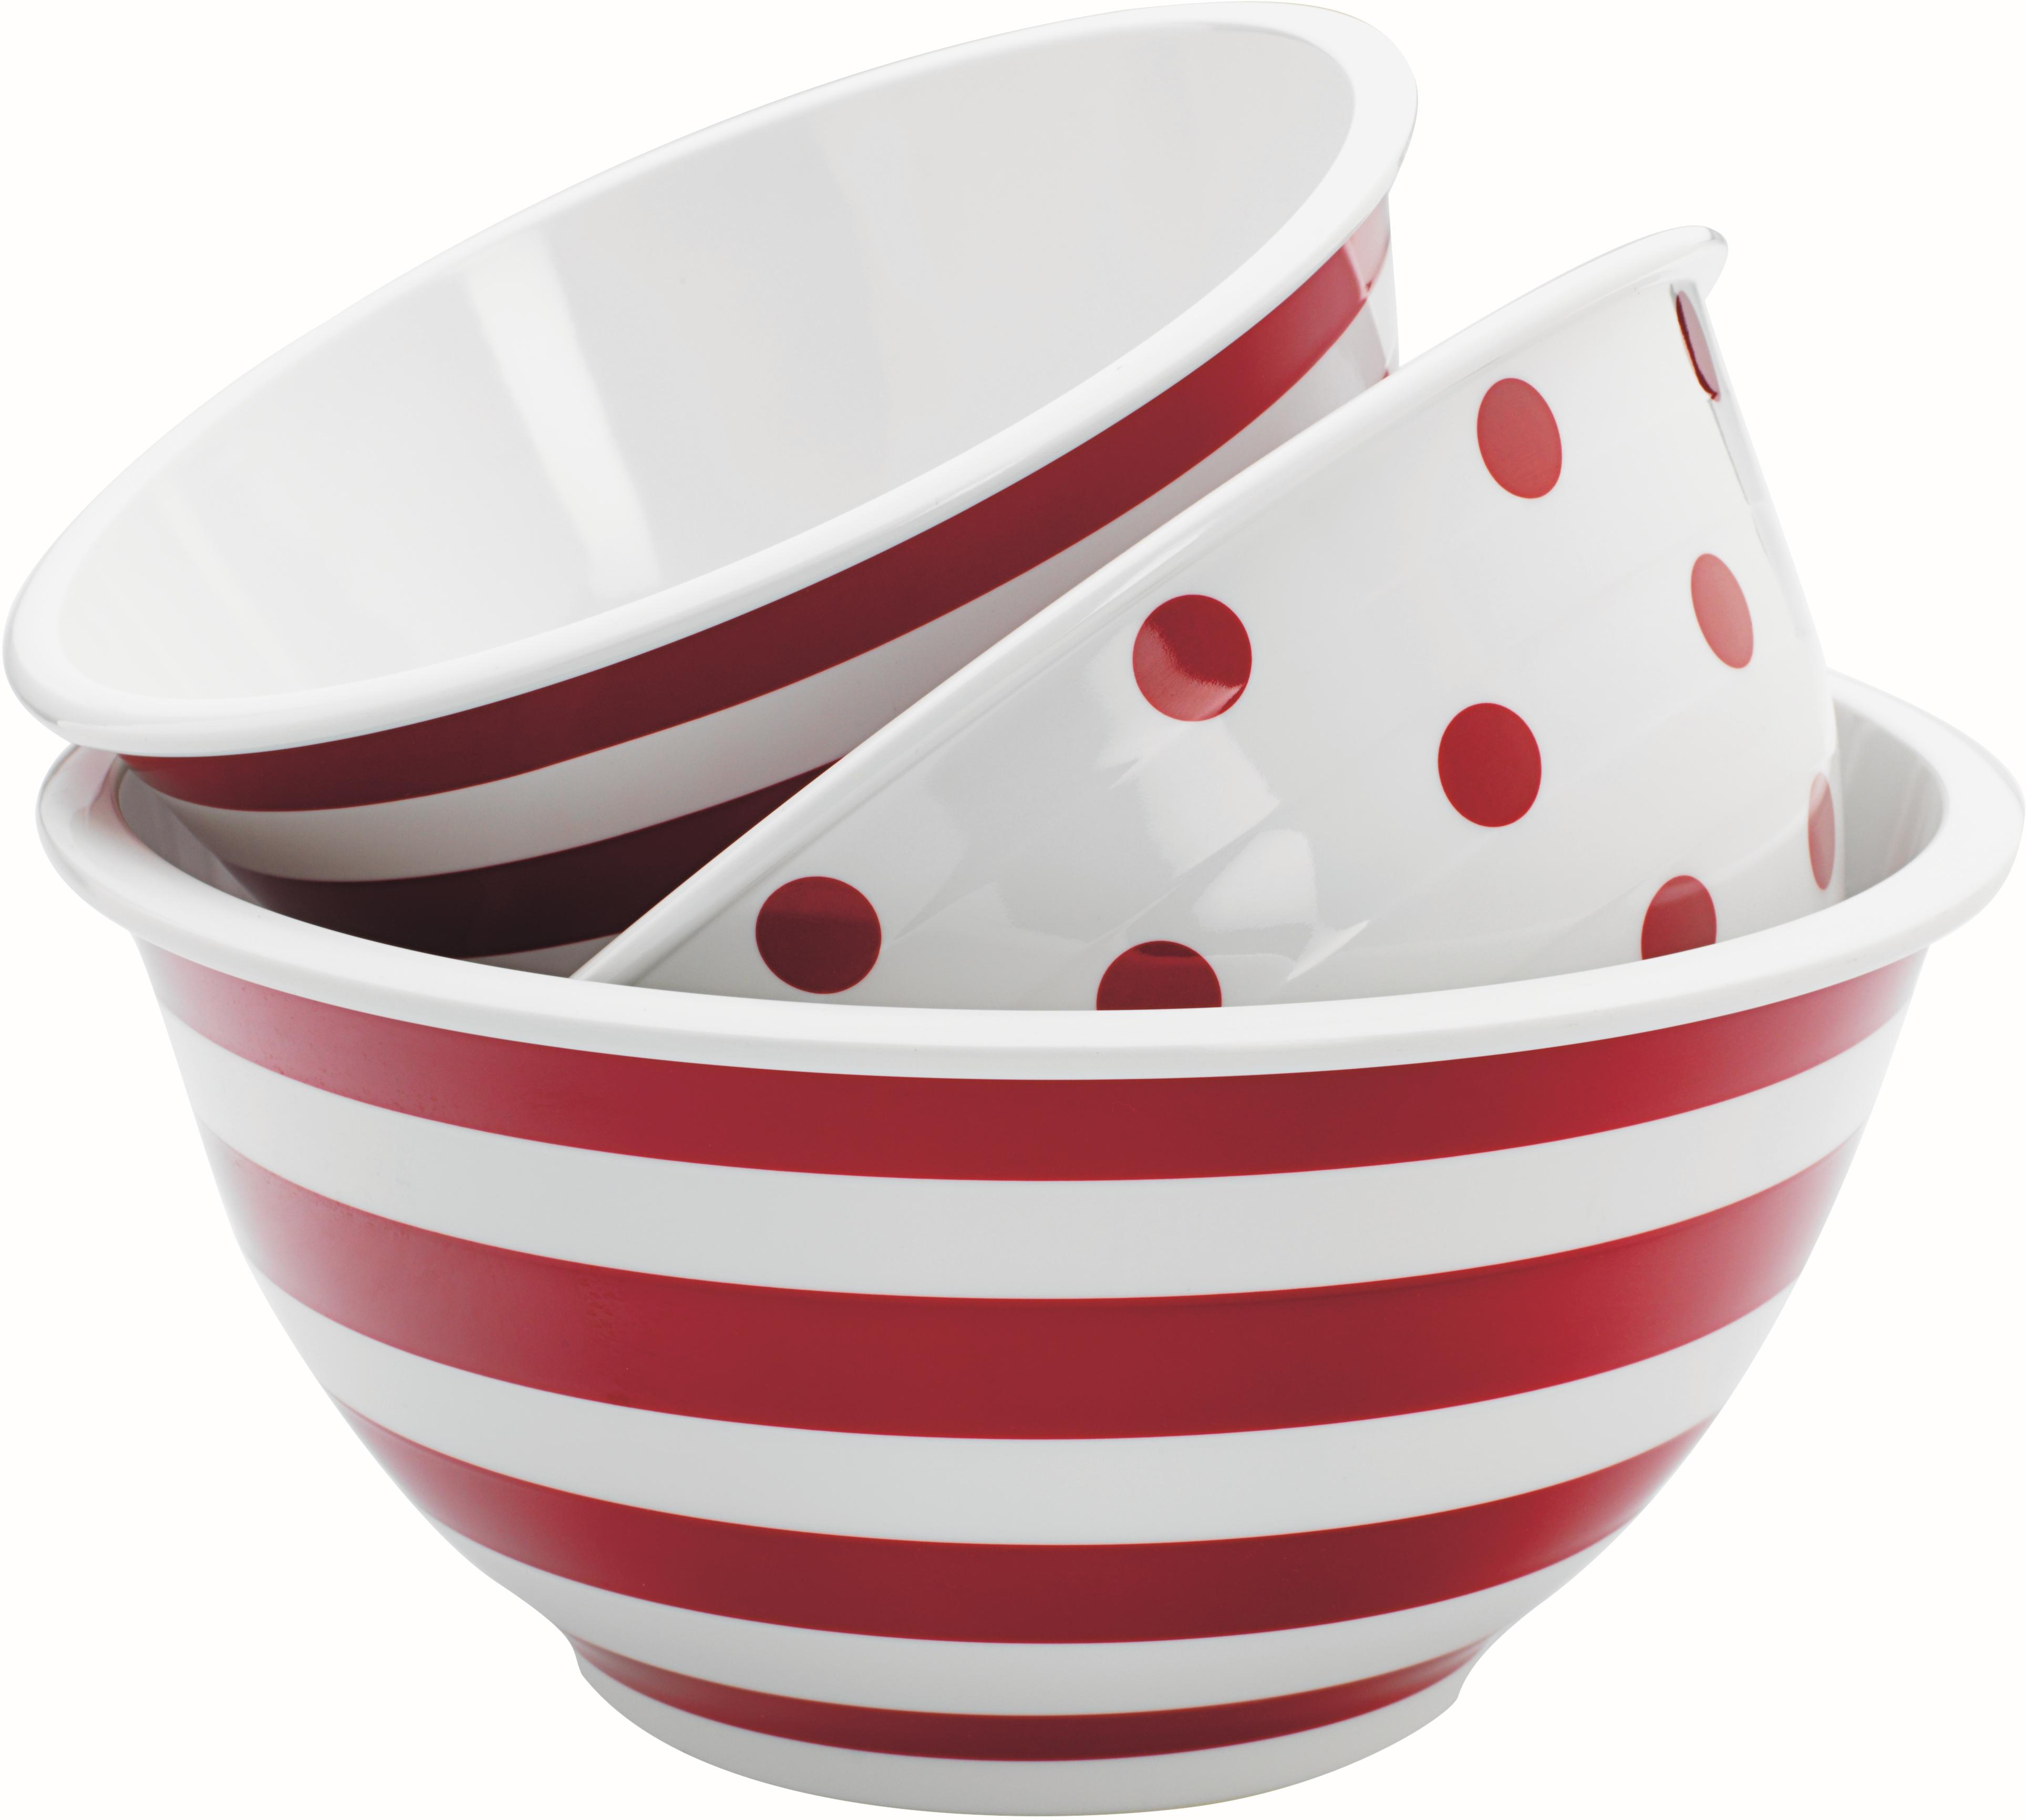 Anchor Hocking 3 Piece Decorated Melamine Mixing Bowl Set